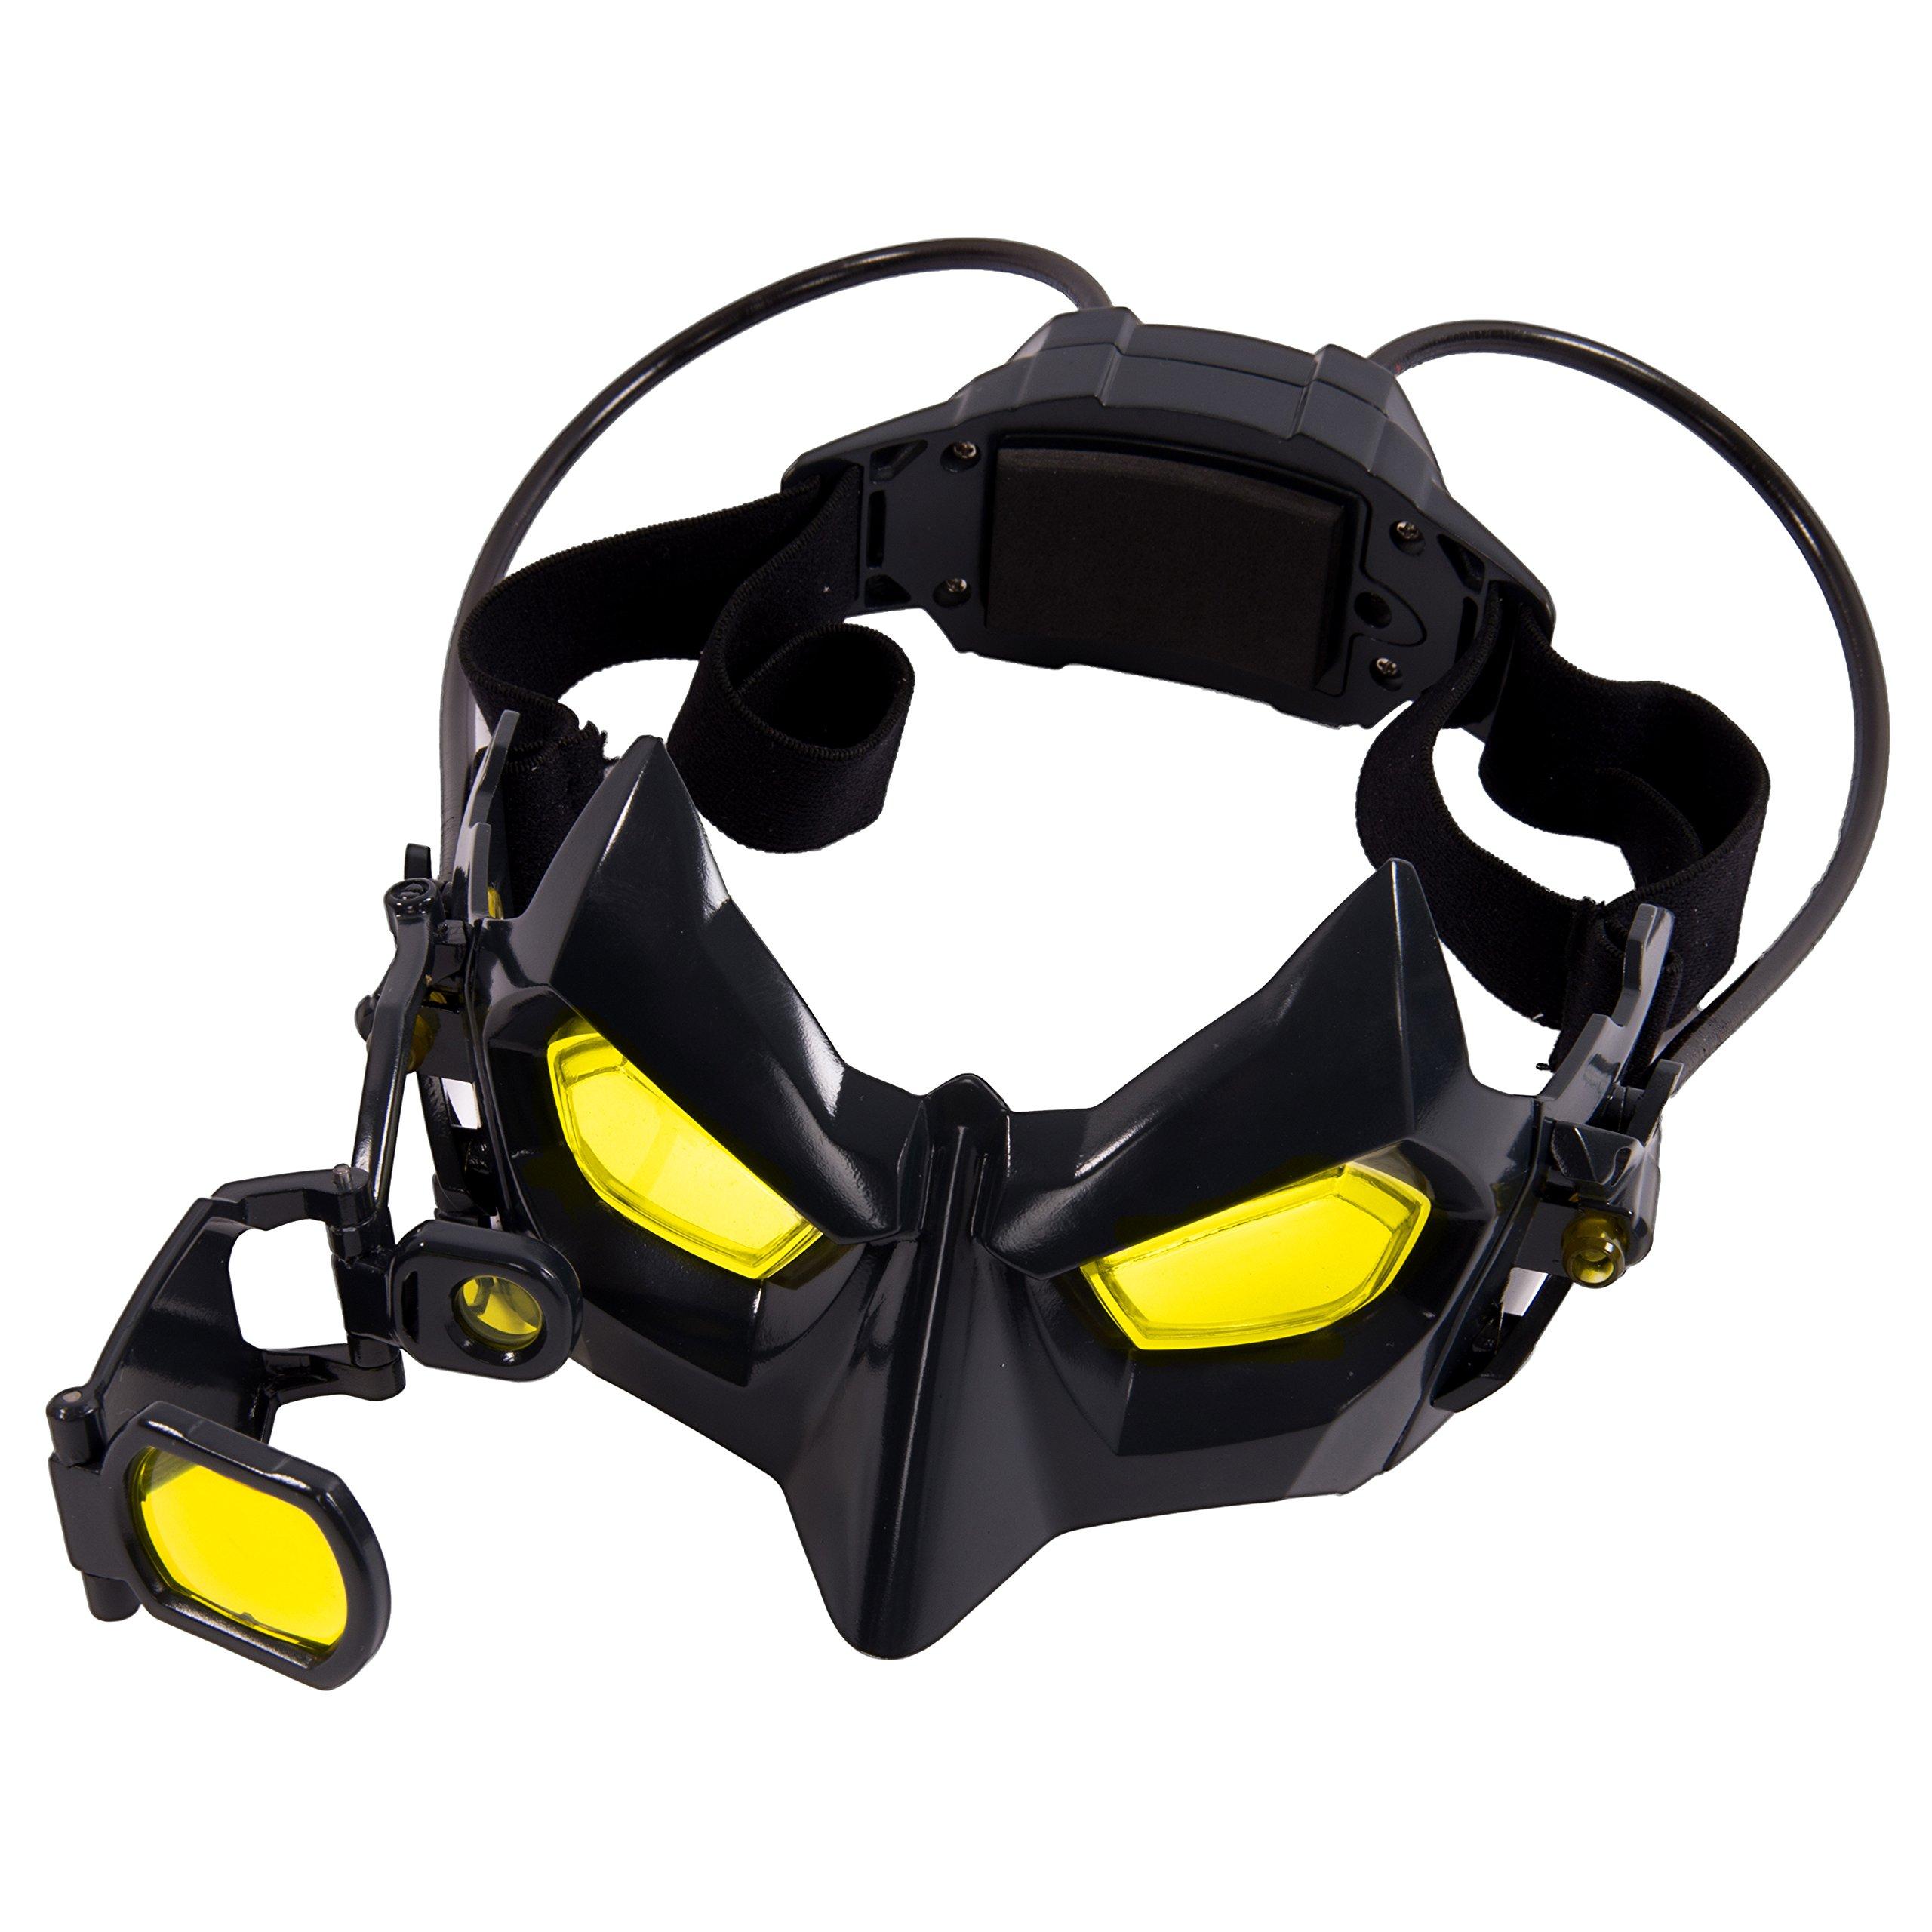 Spy Gear - Batman Night Goggles by Spy Gear (Image #6)